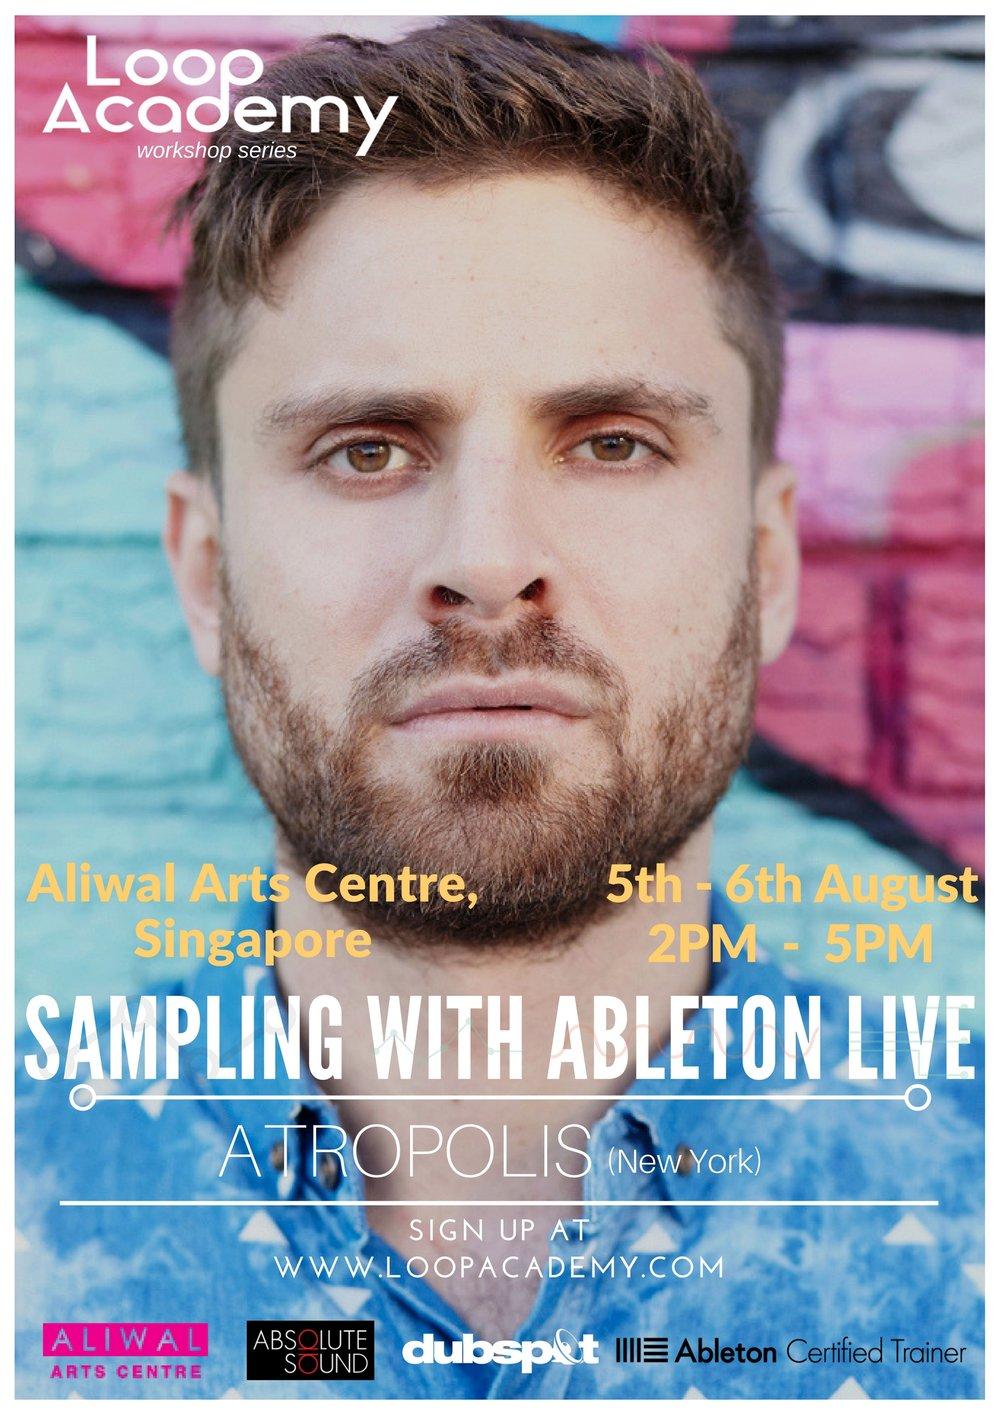 Copy of Sampling with Ableton live_Draft 02.jpg